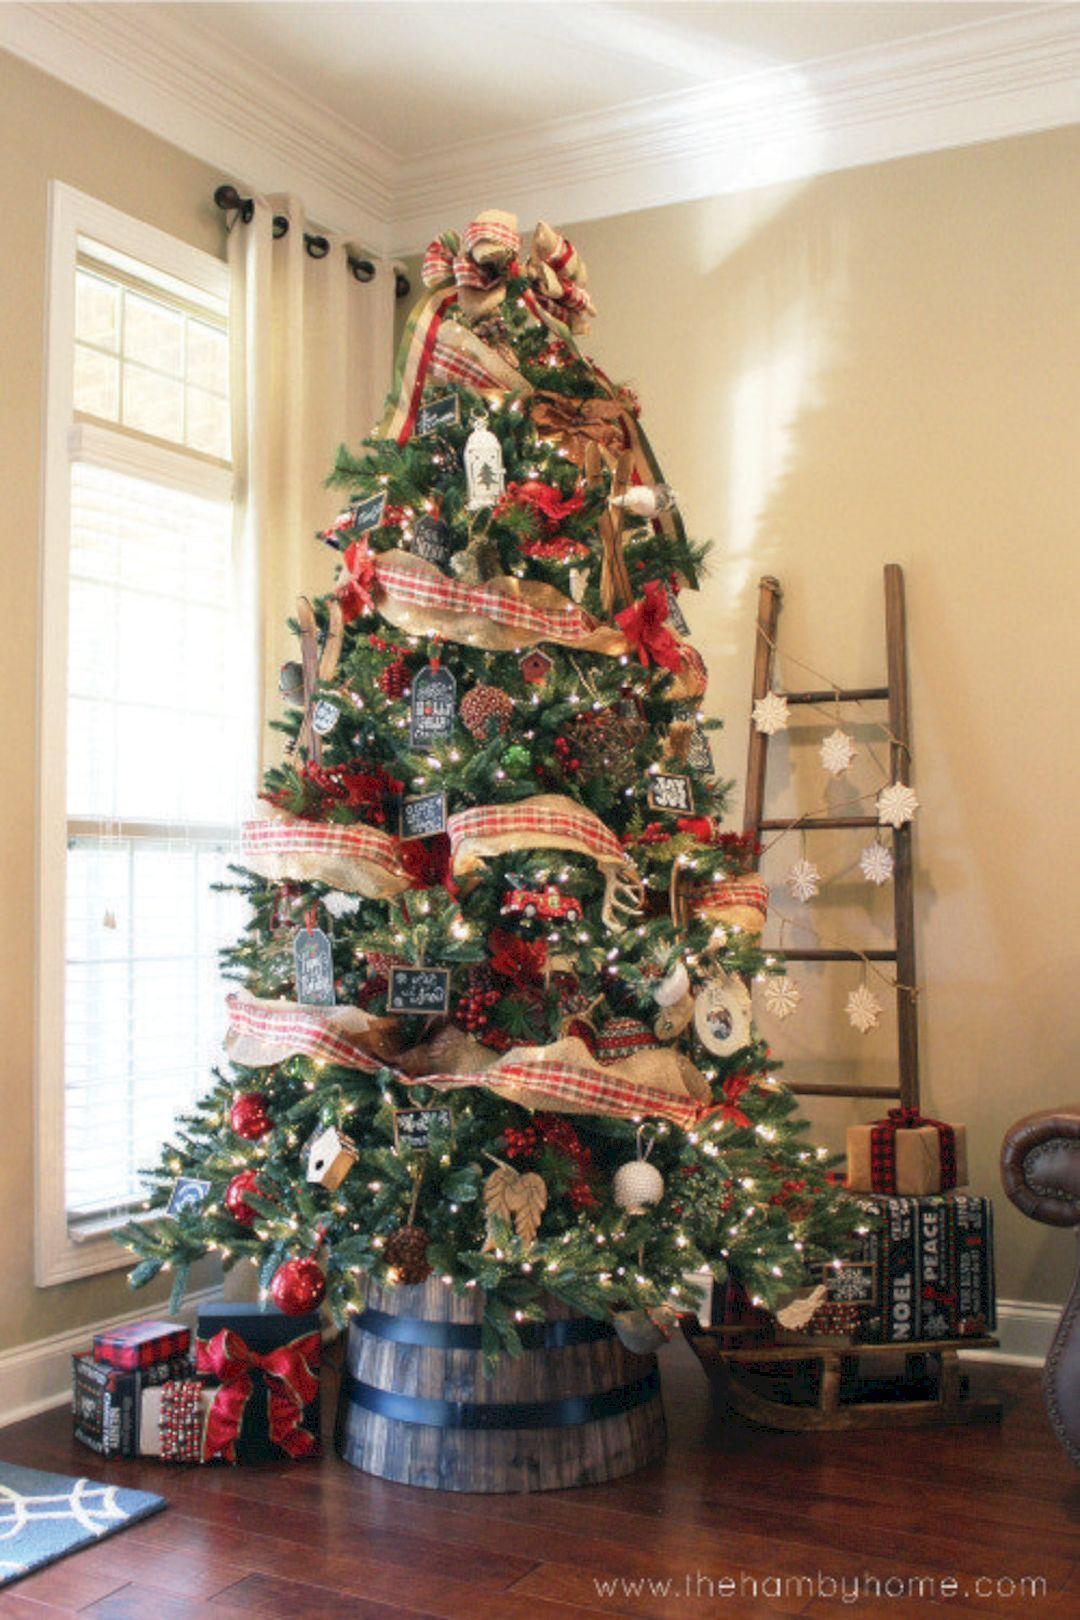 15 Festive Decoration Ideas for Merrier Christmas